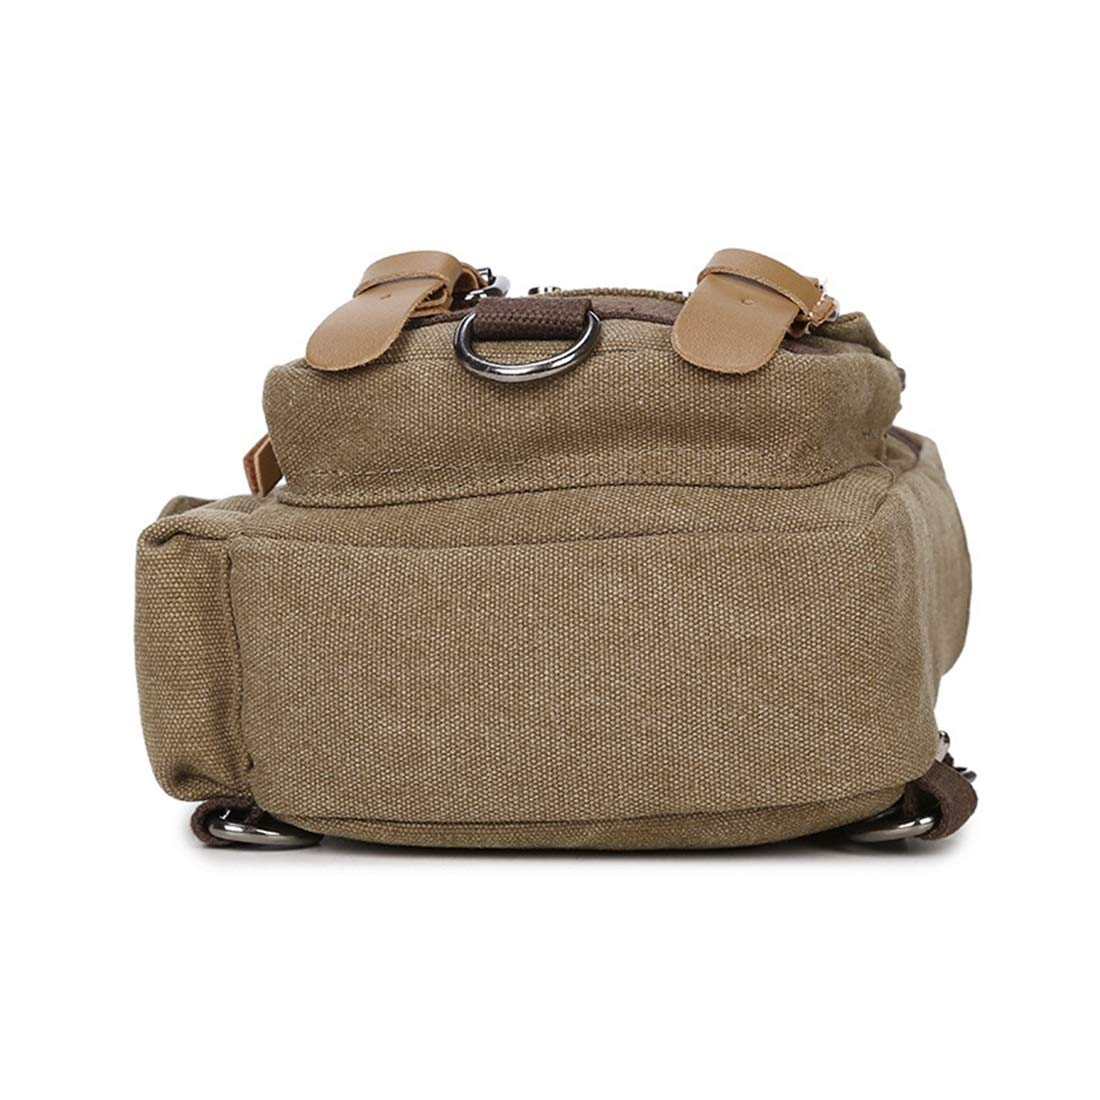 YUKILO Mens Chest Bag Zipper Canvas Waterproof Messenger Bag Shoulder Bag Color: Khaki Color : Brown